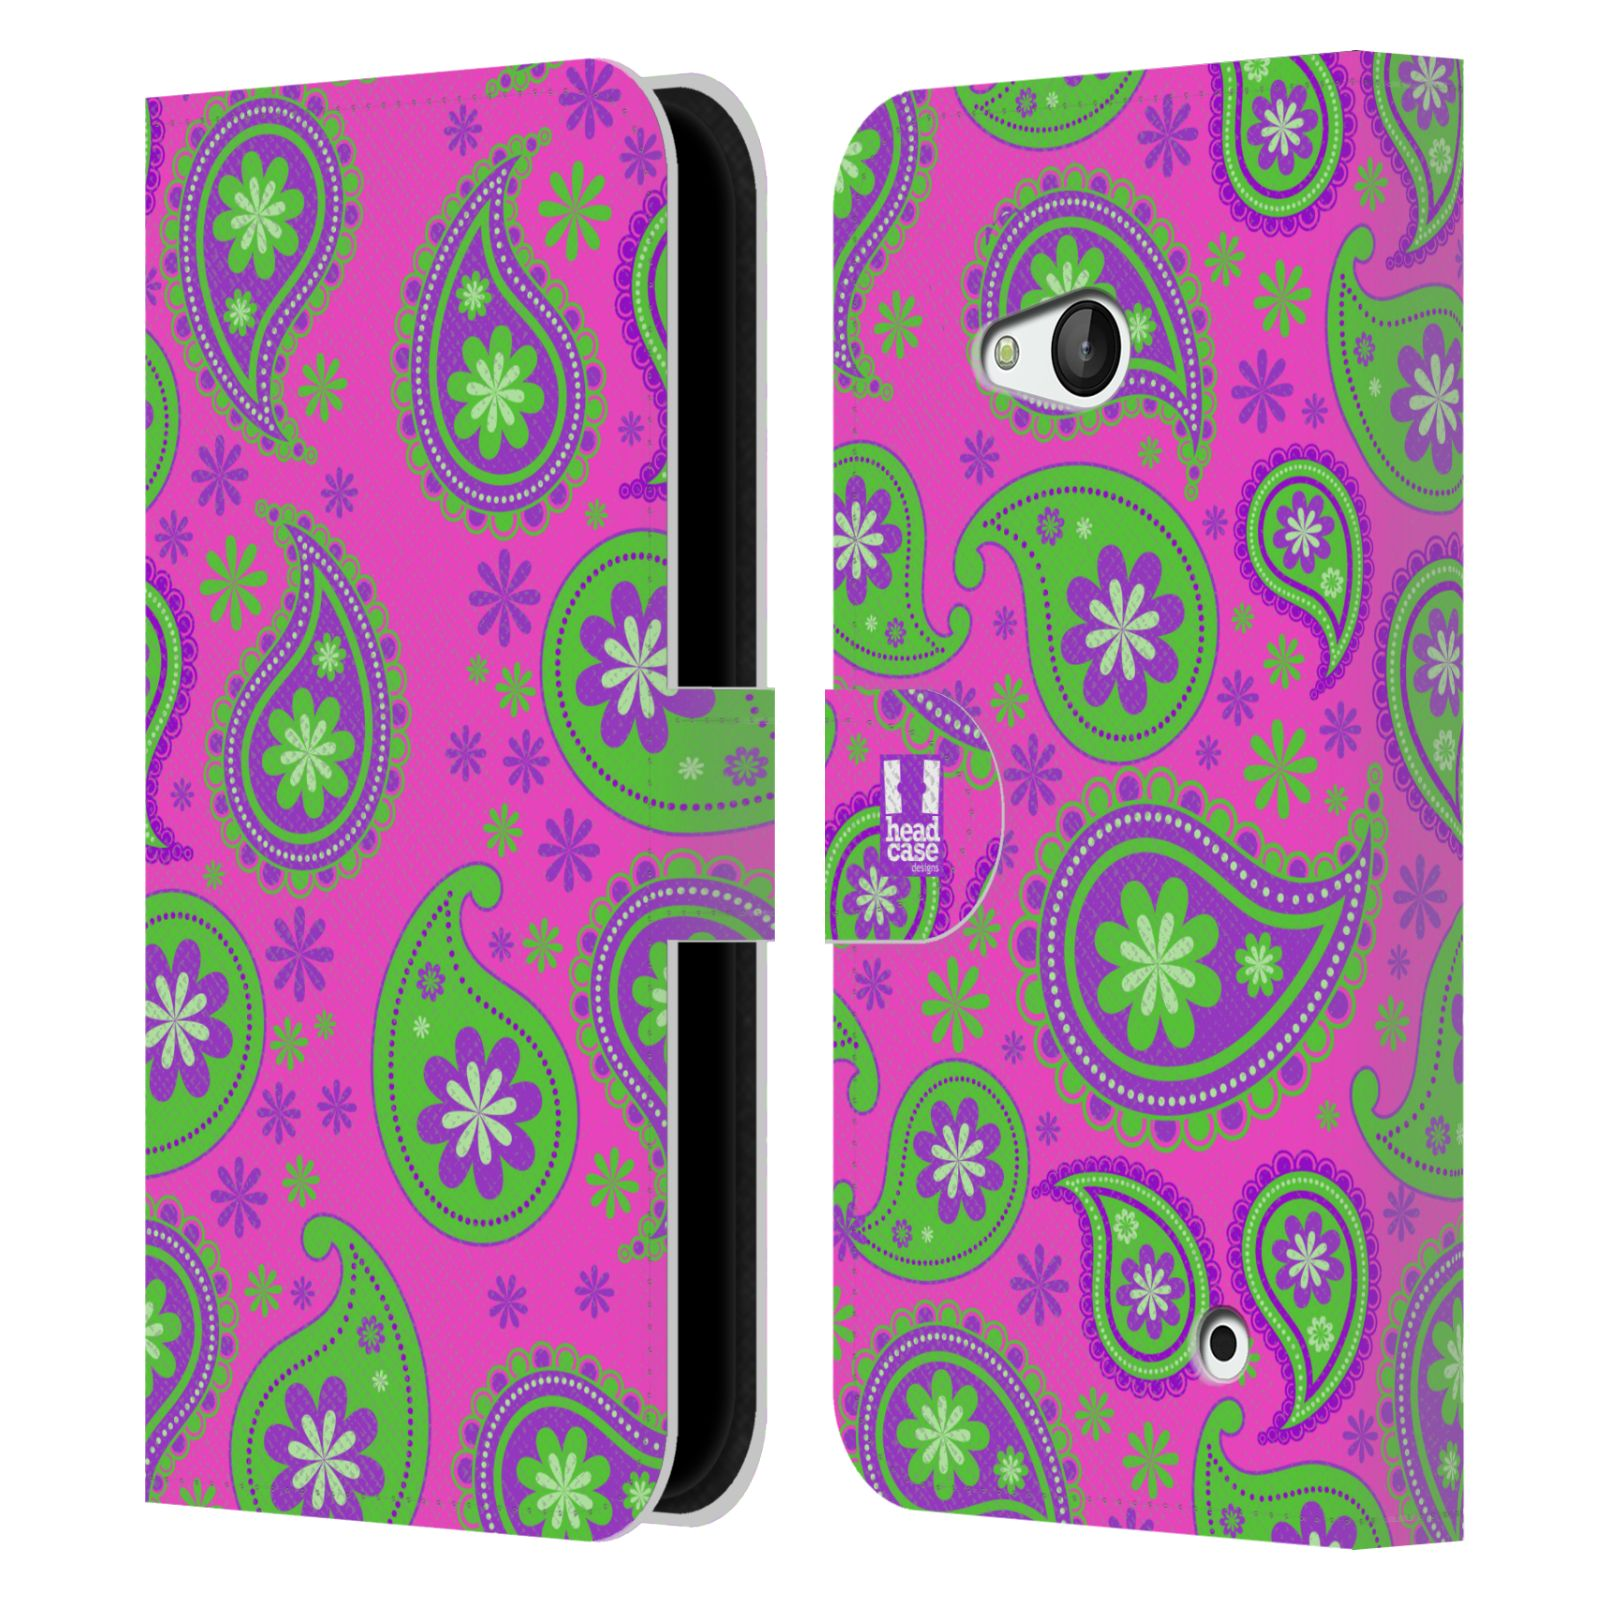 HEAD CASE Flipové pouzdro pro mobil NOKIA / MICROSOFT LUMIA 640 / LUMIA 640 DUAL snové slzy fialová